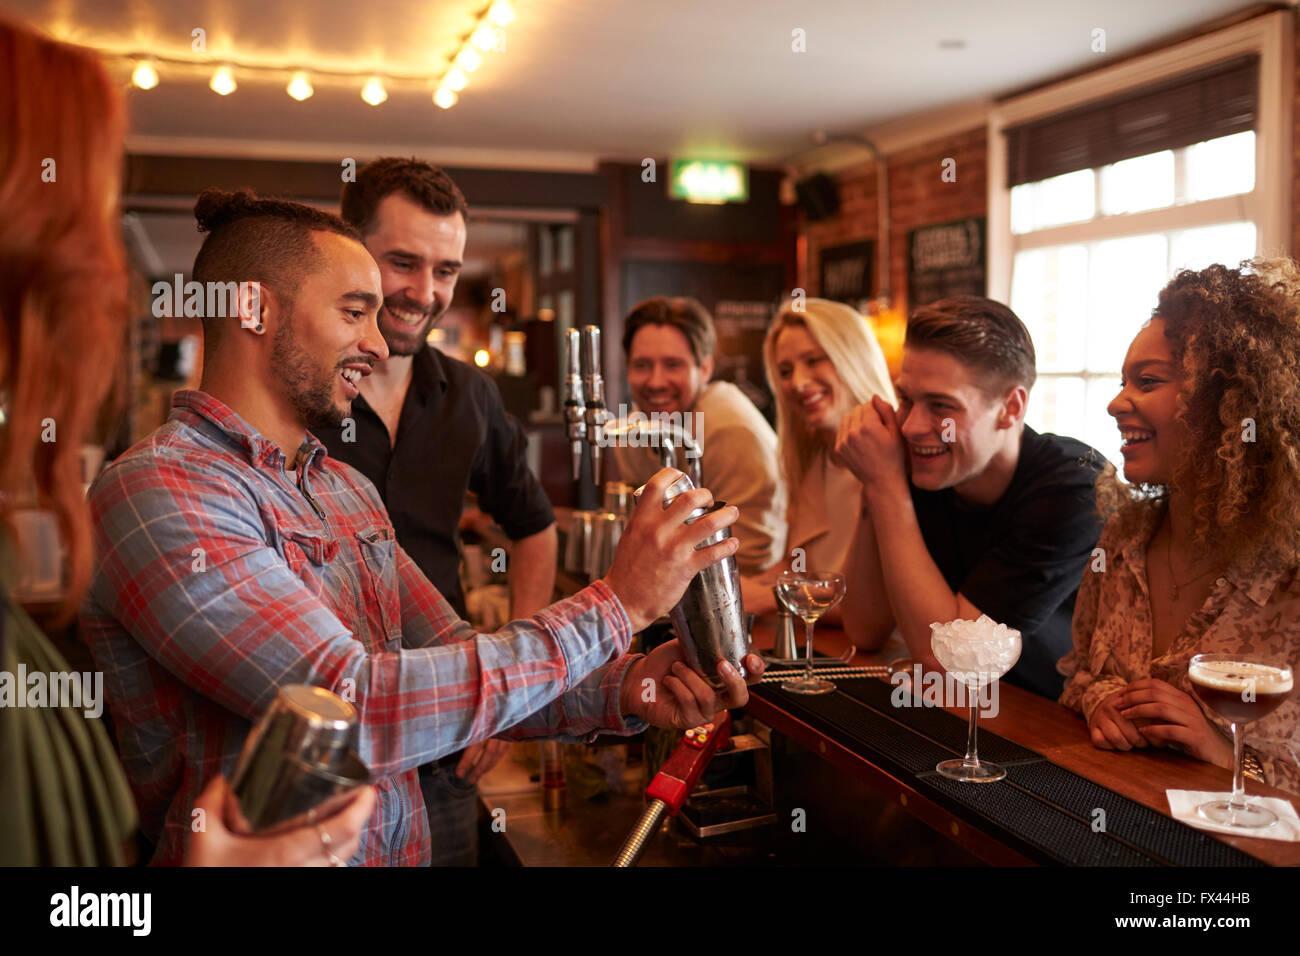 Menschen lernen, wie man bei Lektion Cocktail Mixen In Bar Stockbild